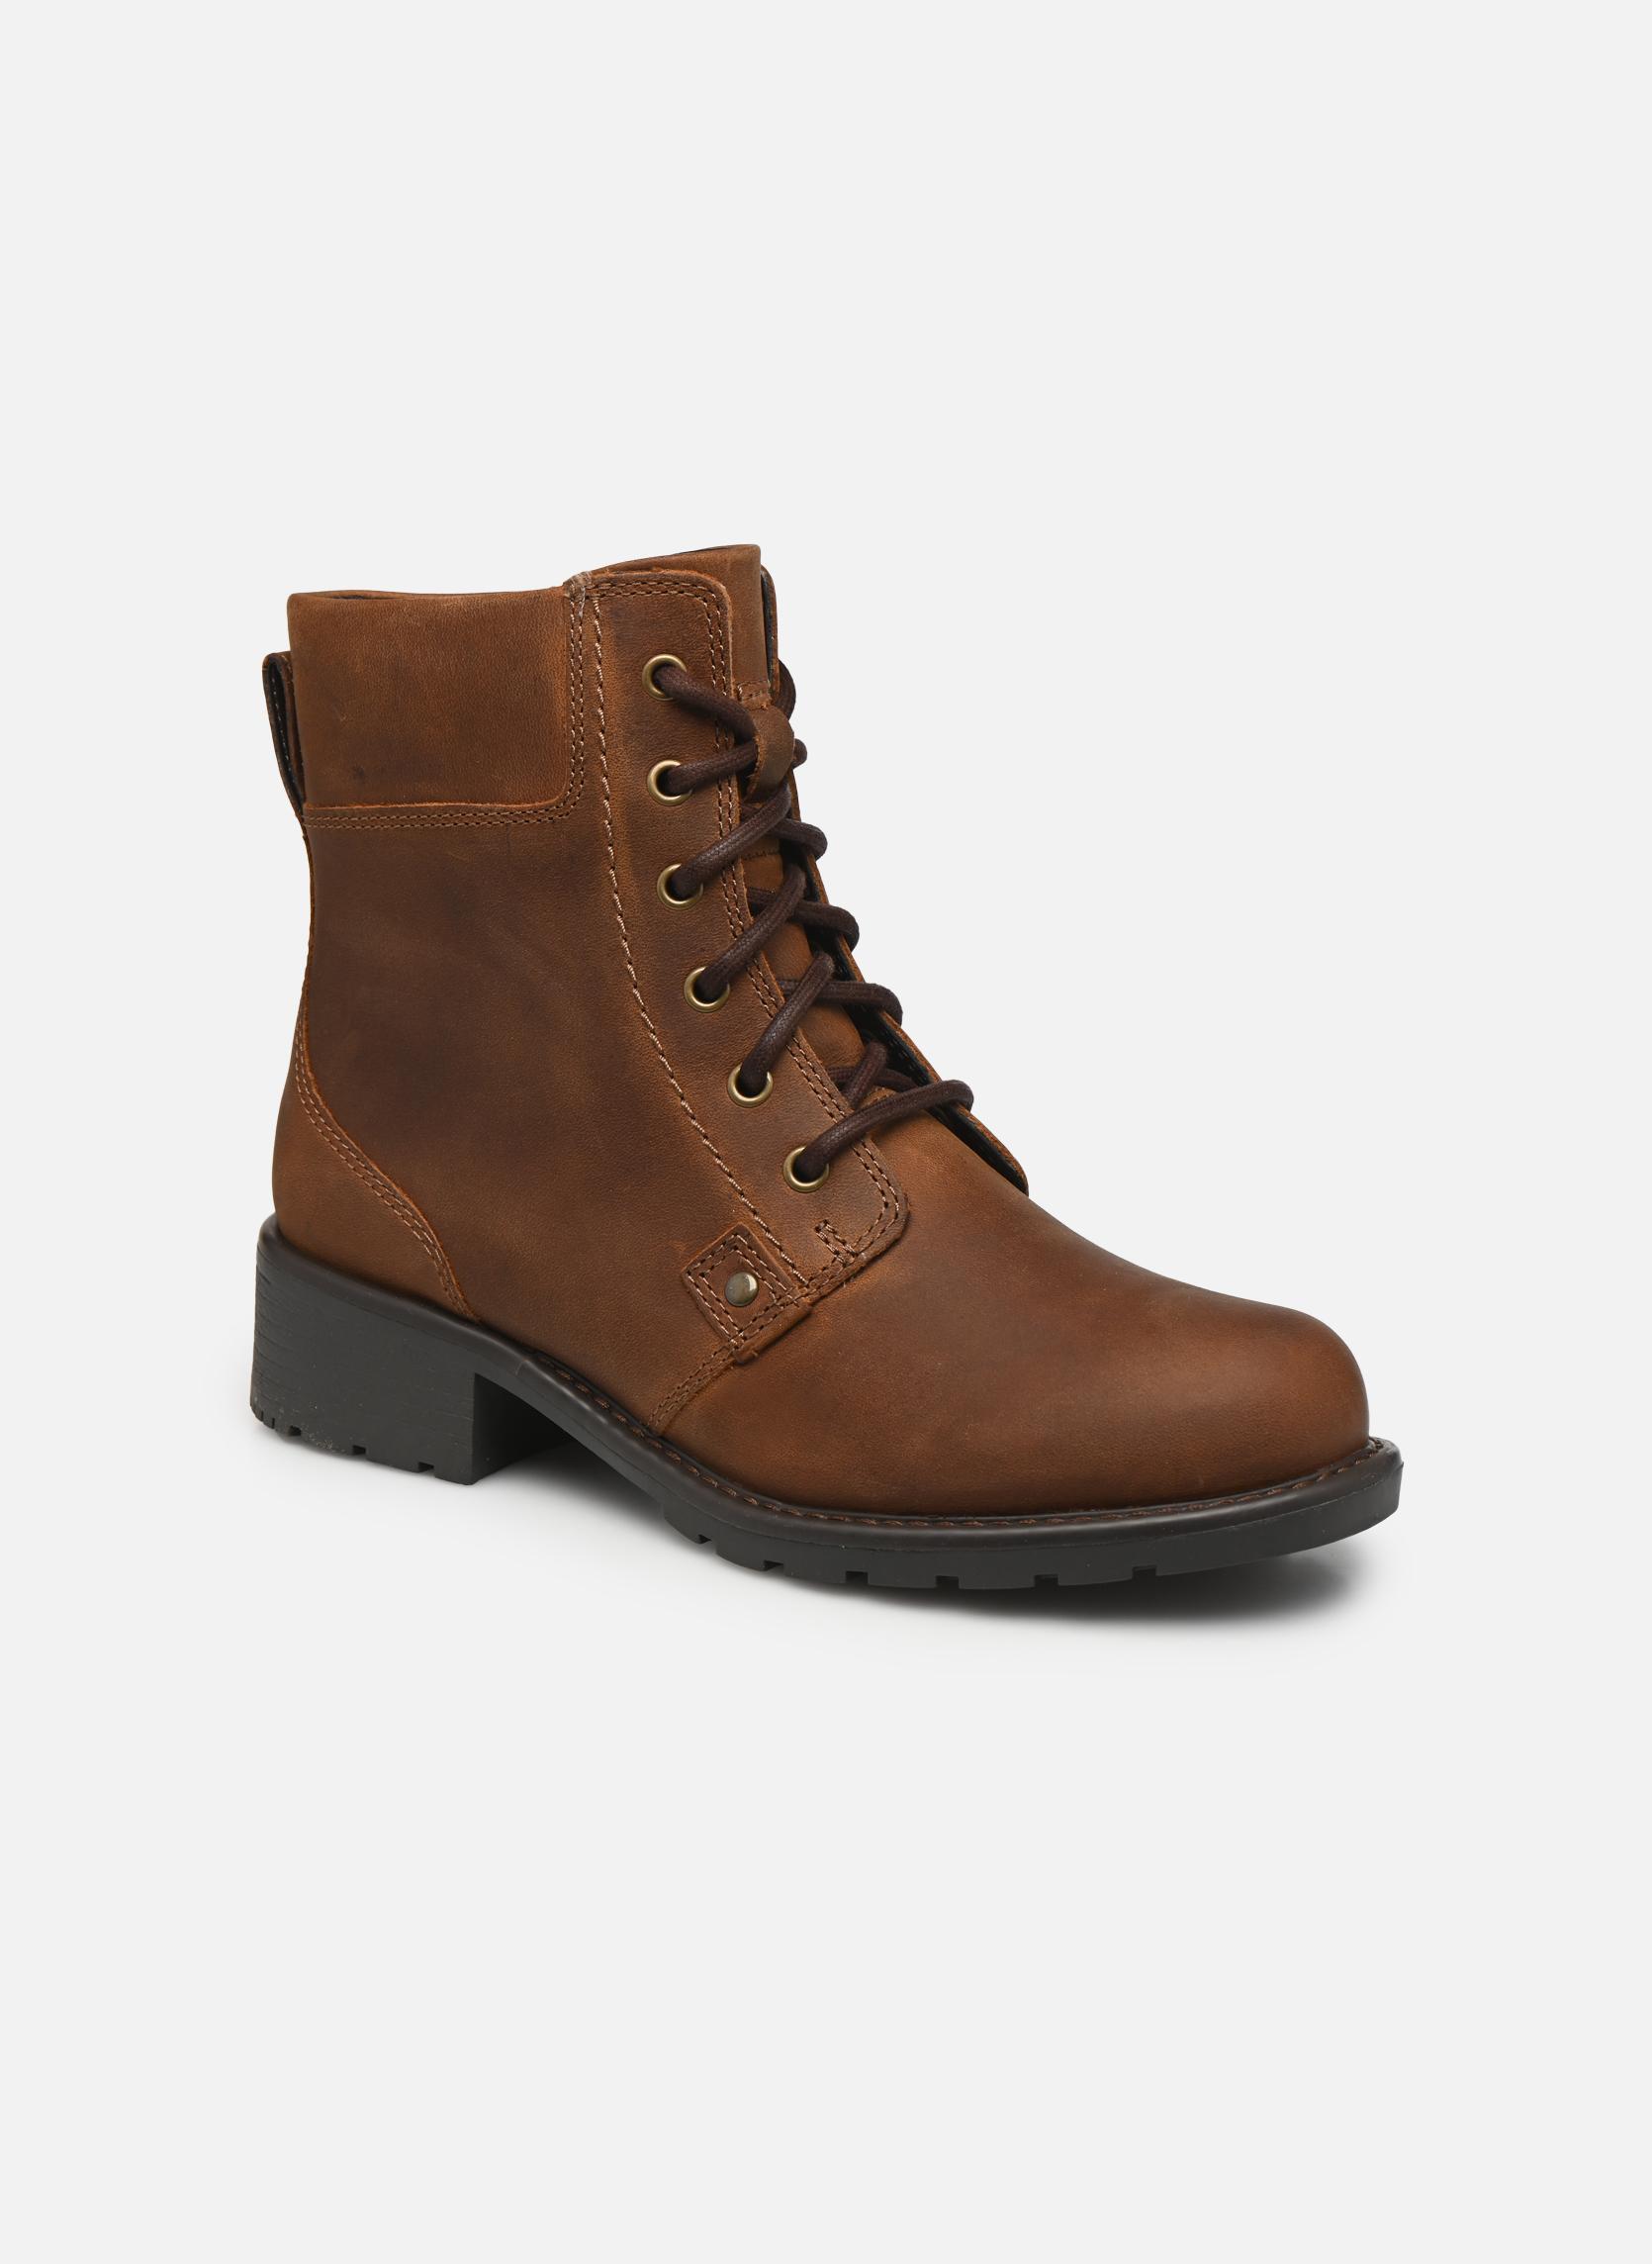 Bottines et boots Femme Orinoco Spice